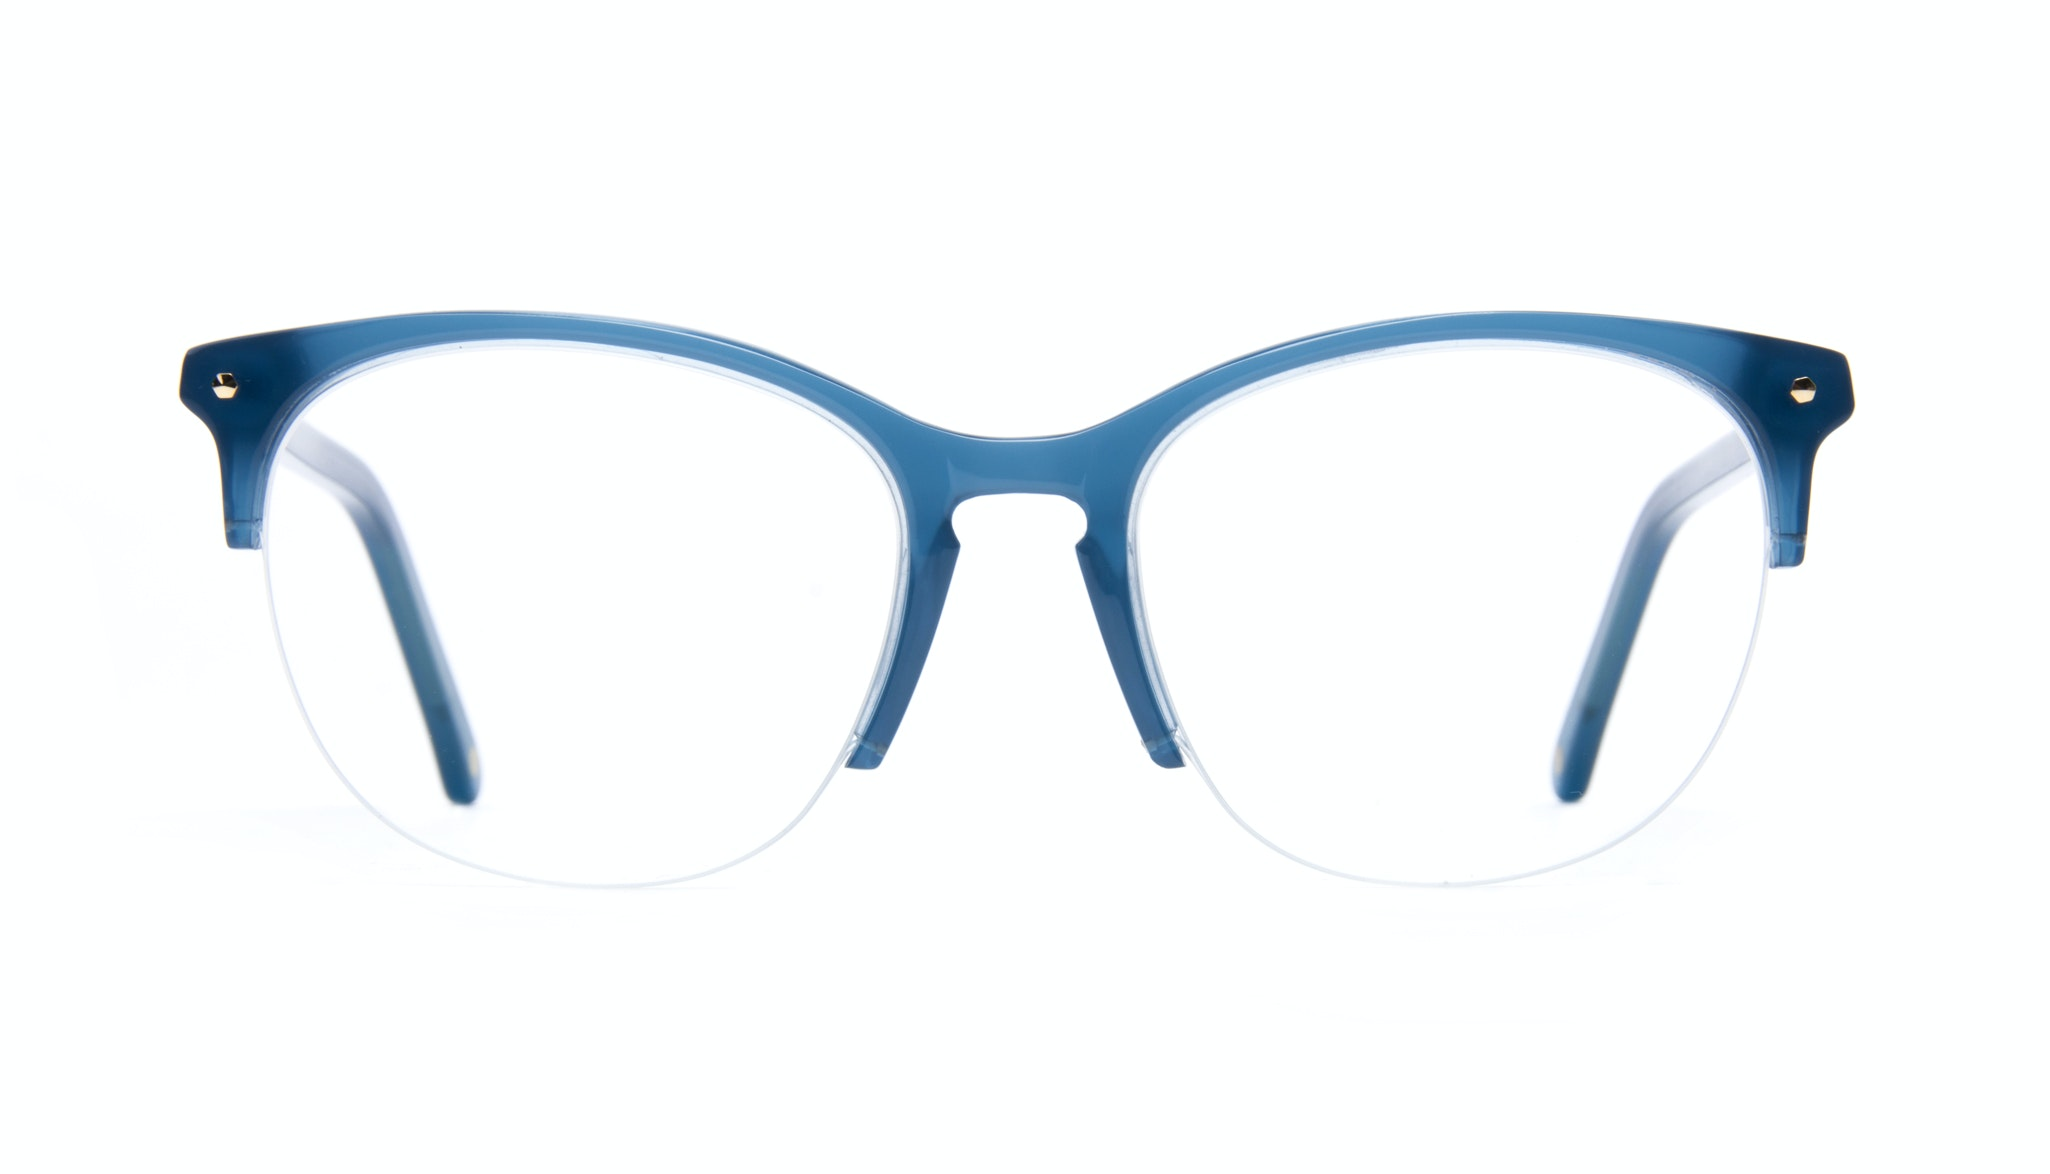 Affordable Fashion Glasses Rectangle Square Round Semi-Rimless Eyeglasses Women Nadine Light Marine Front